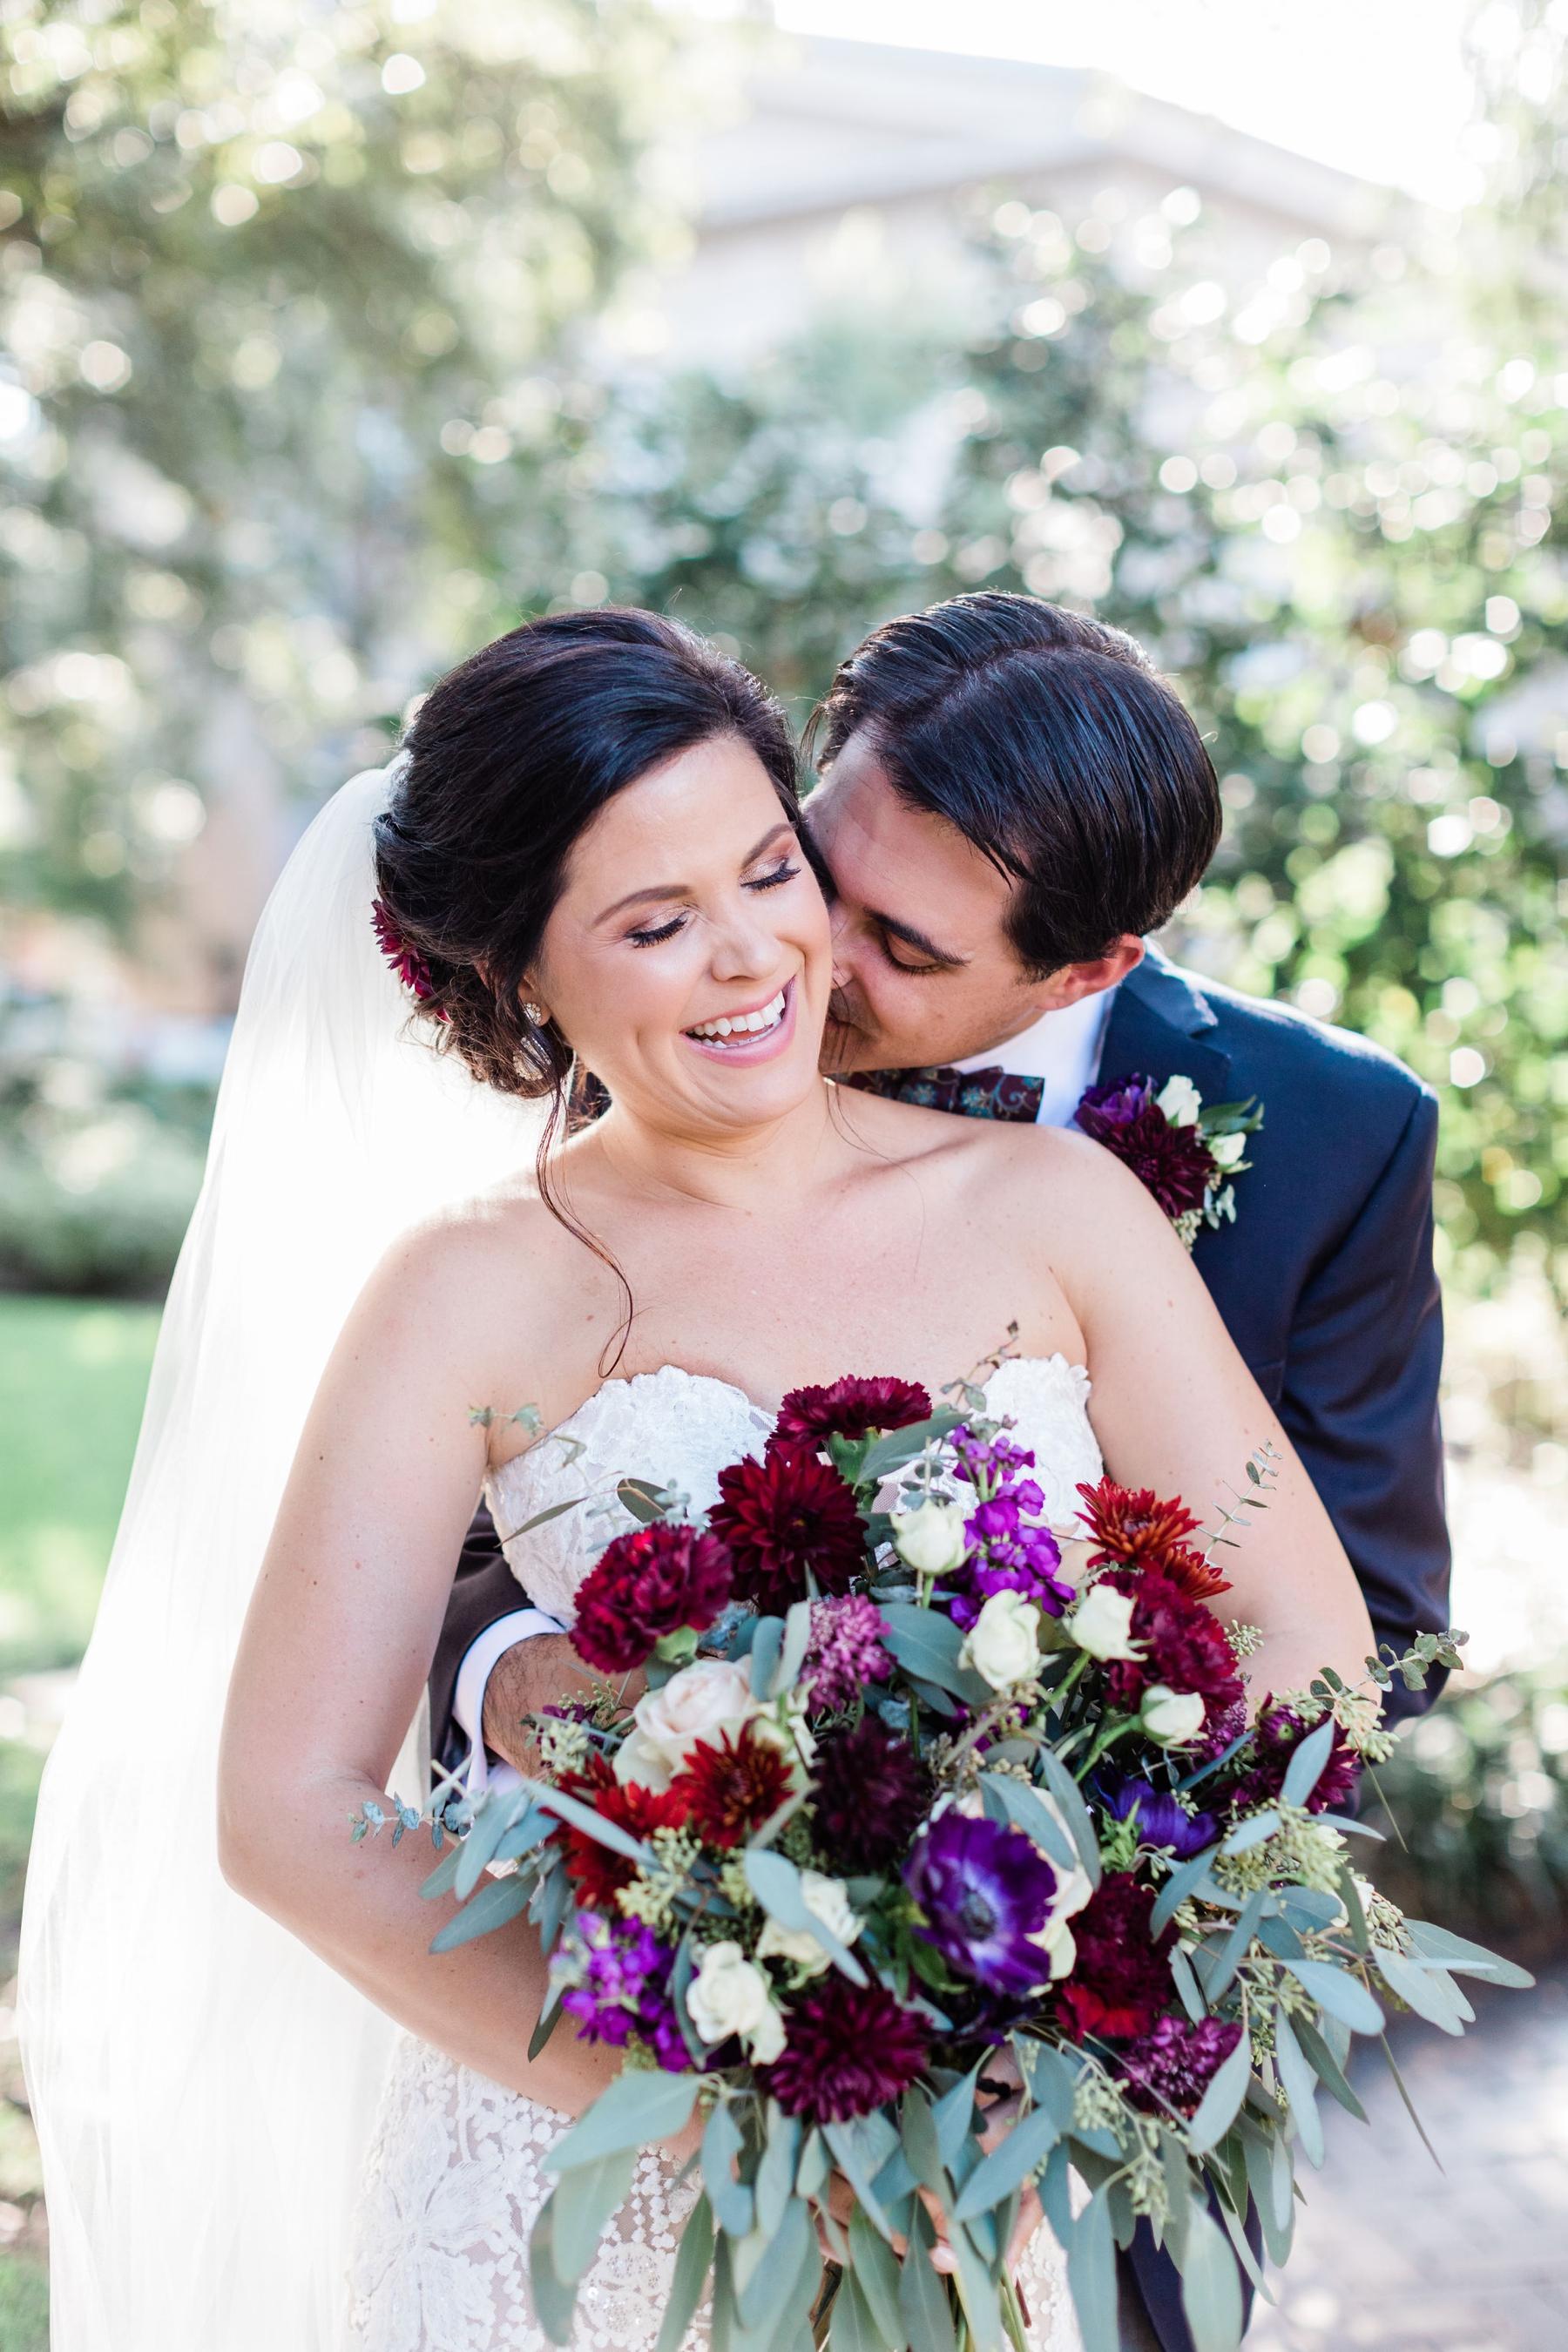 Danielle and Travis – Forsyth Park Wedding – Savannah Wedding Photographer | Apt. B PhotographyDanielle and Travis – Forsyth Park Wedding – Savannah Wedding Photographer | Apt. B Photography